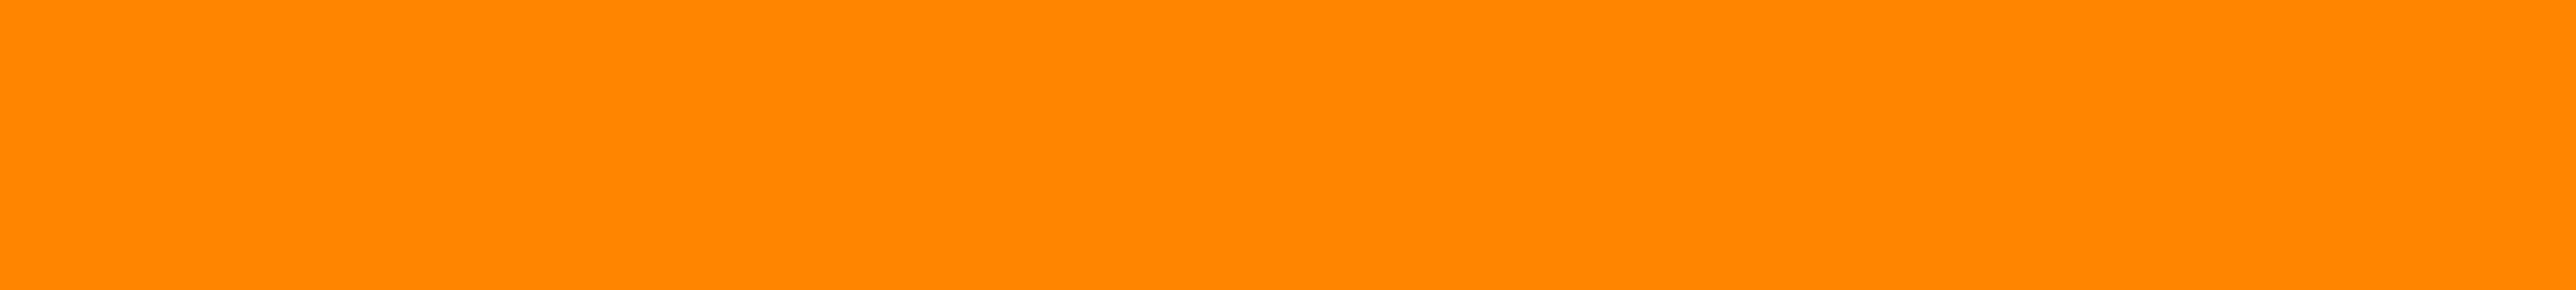 Orange Wildcats